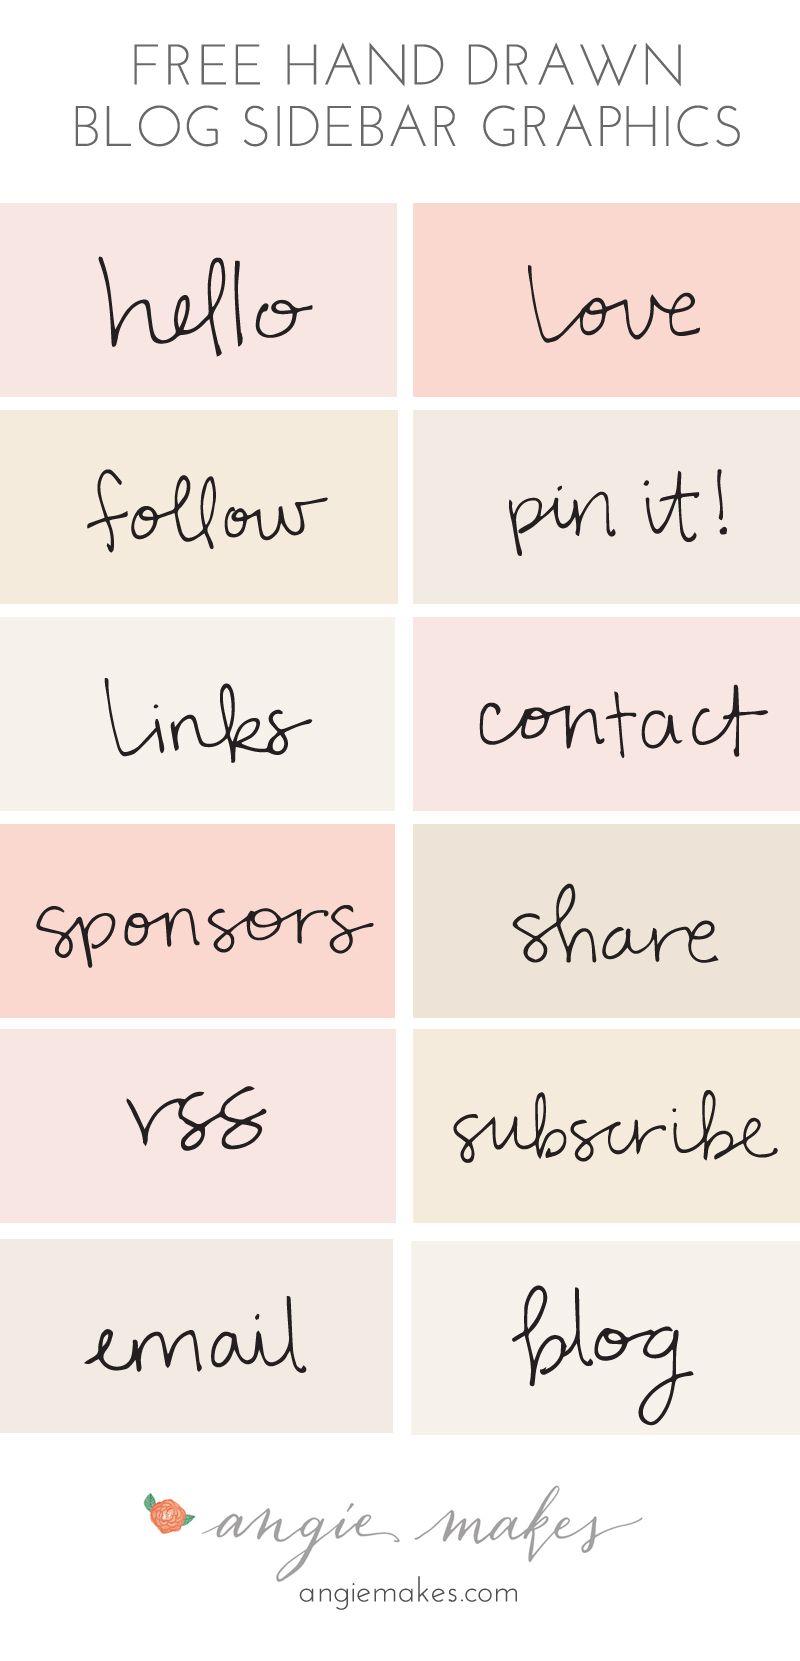 Free Blog Sidebar Graphics | Free blog, Hand drawn and Graphics